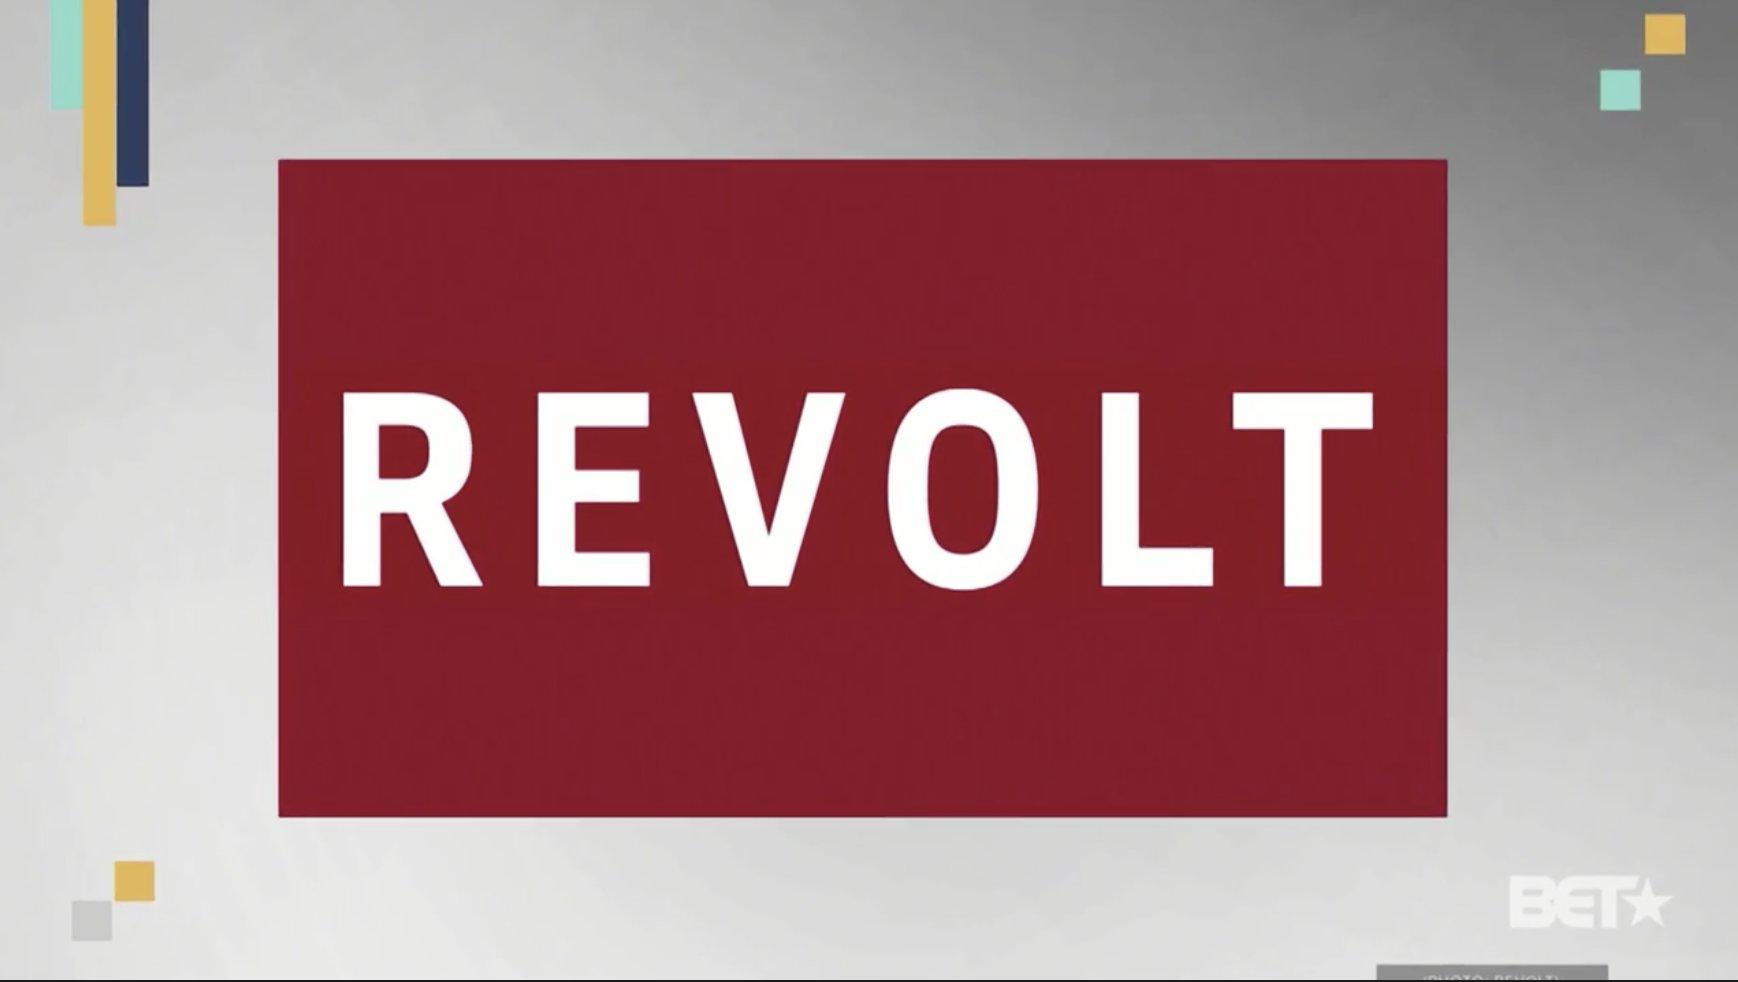 #Revolt has a massive layoff.  #BETBreaks https://t.co/6zjSxkJbBh